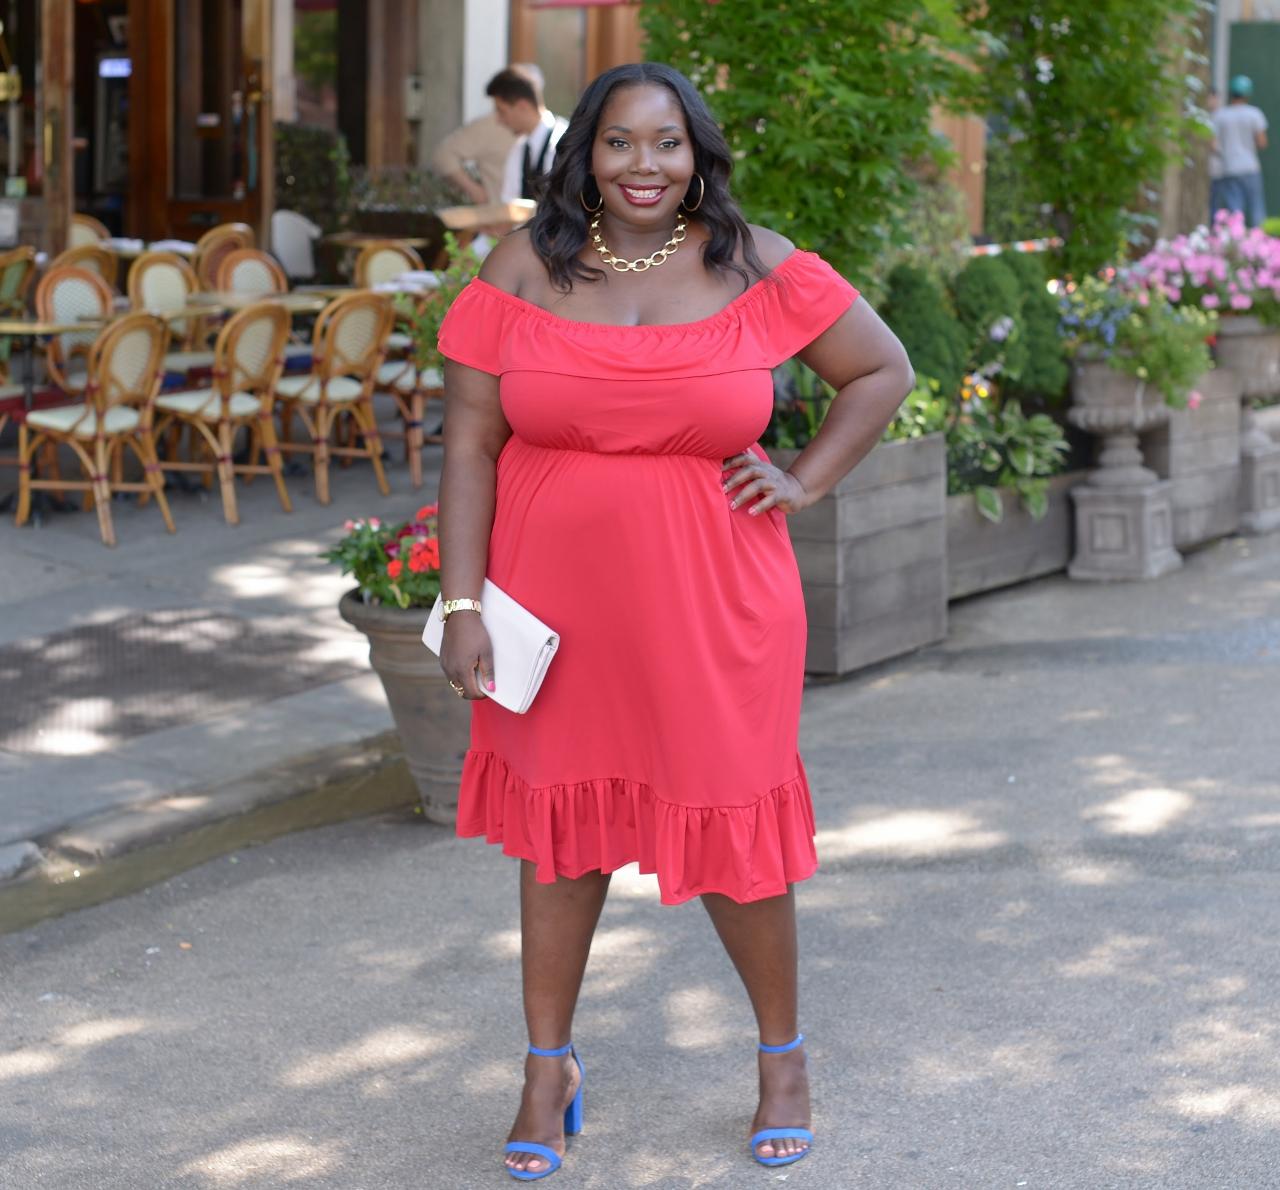 TJMaxx Plus Size Dresses For Summer